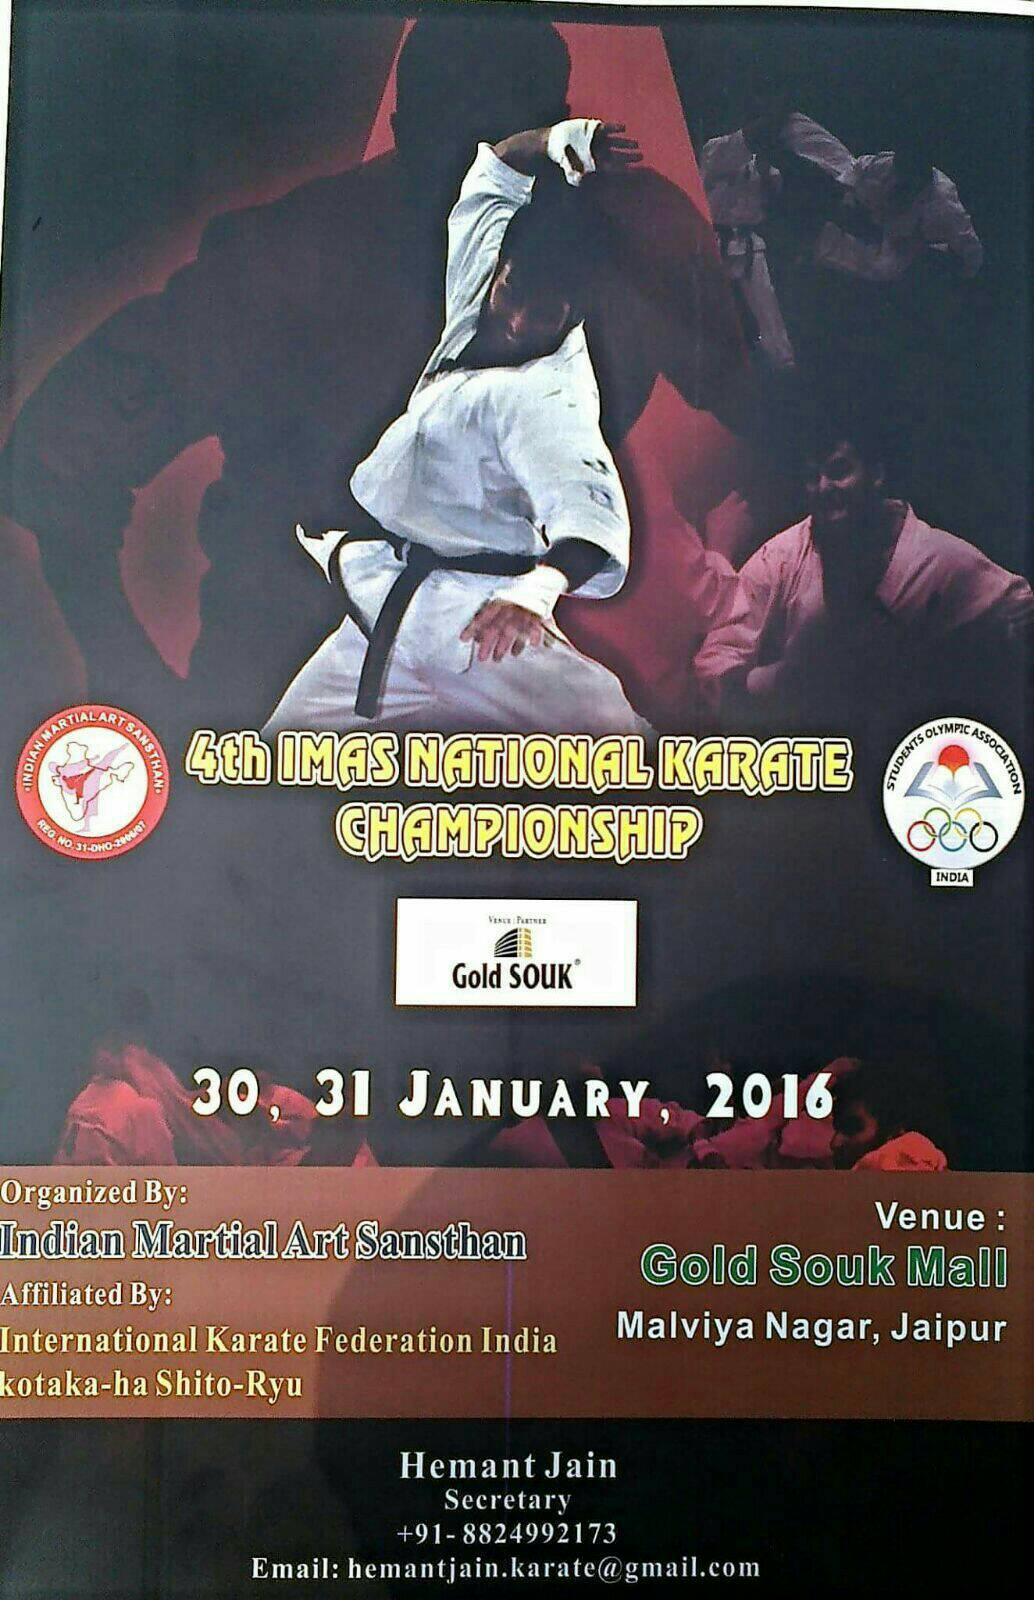 Indian Martial Art Sansthan